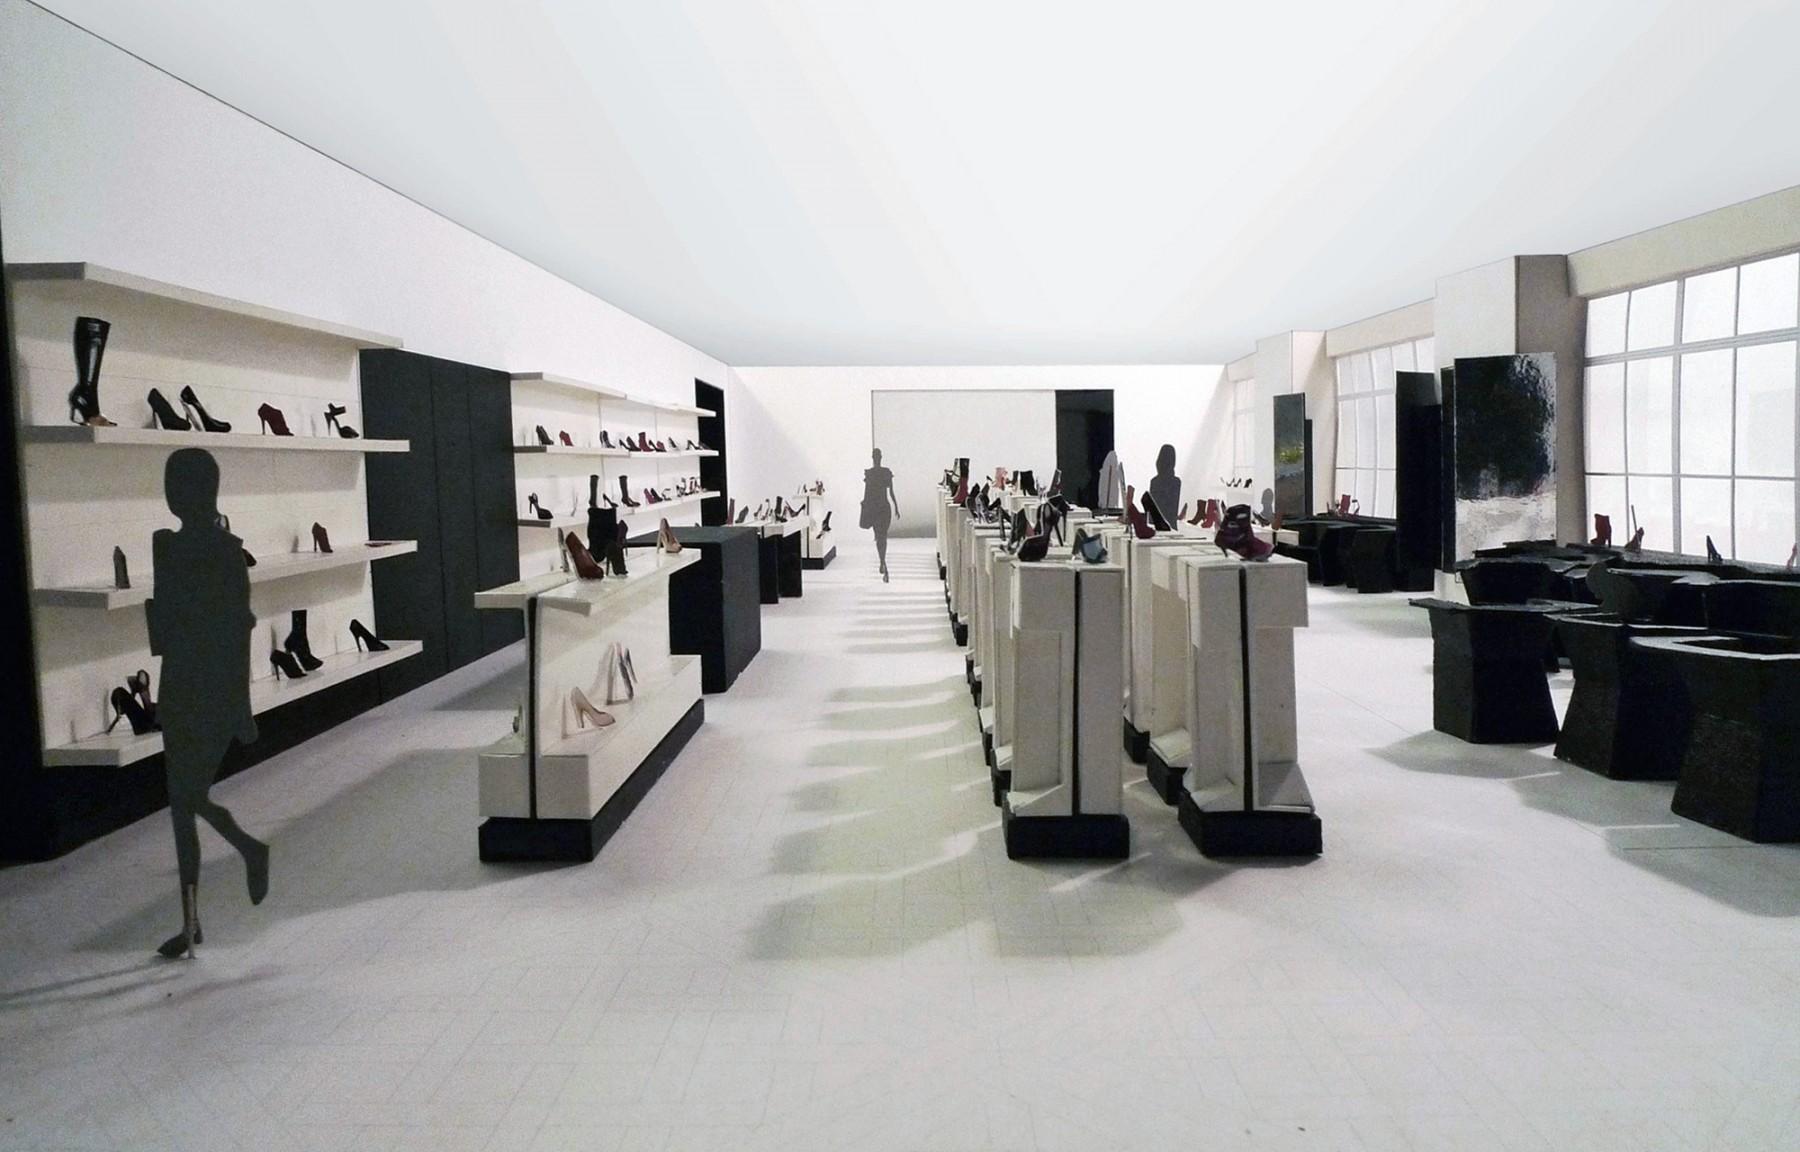 Selfridges-London-designer-fashion-retail-Jamie-Fobert-Architects-shoe-galleries-alabaster-plinths-model